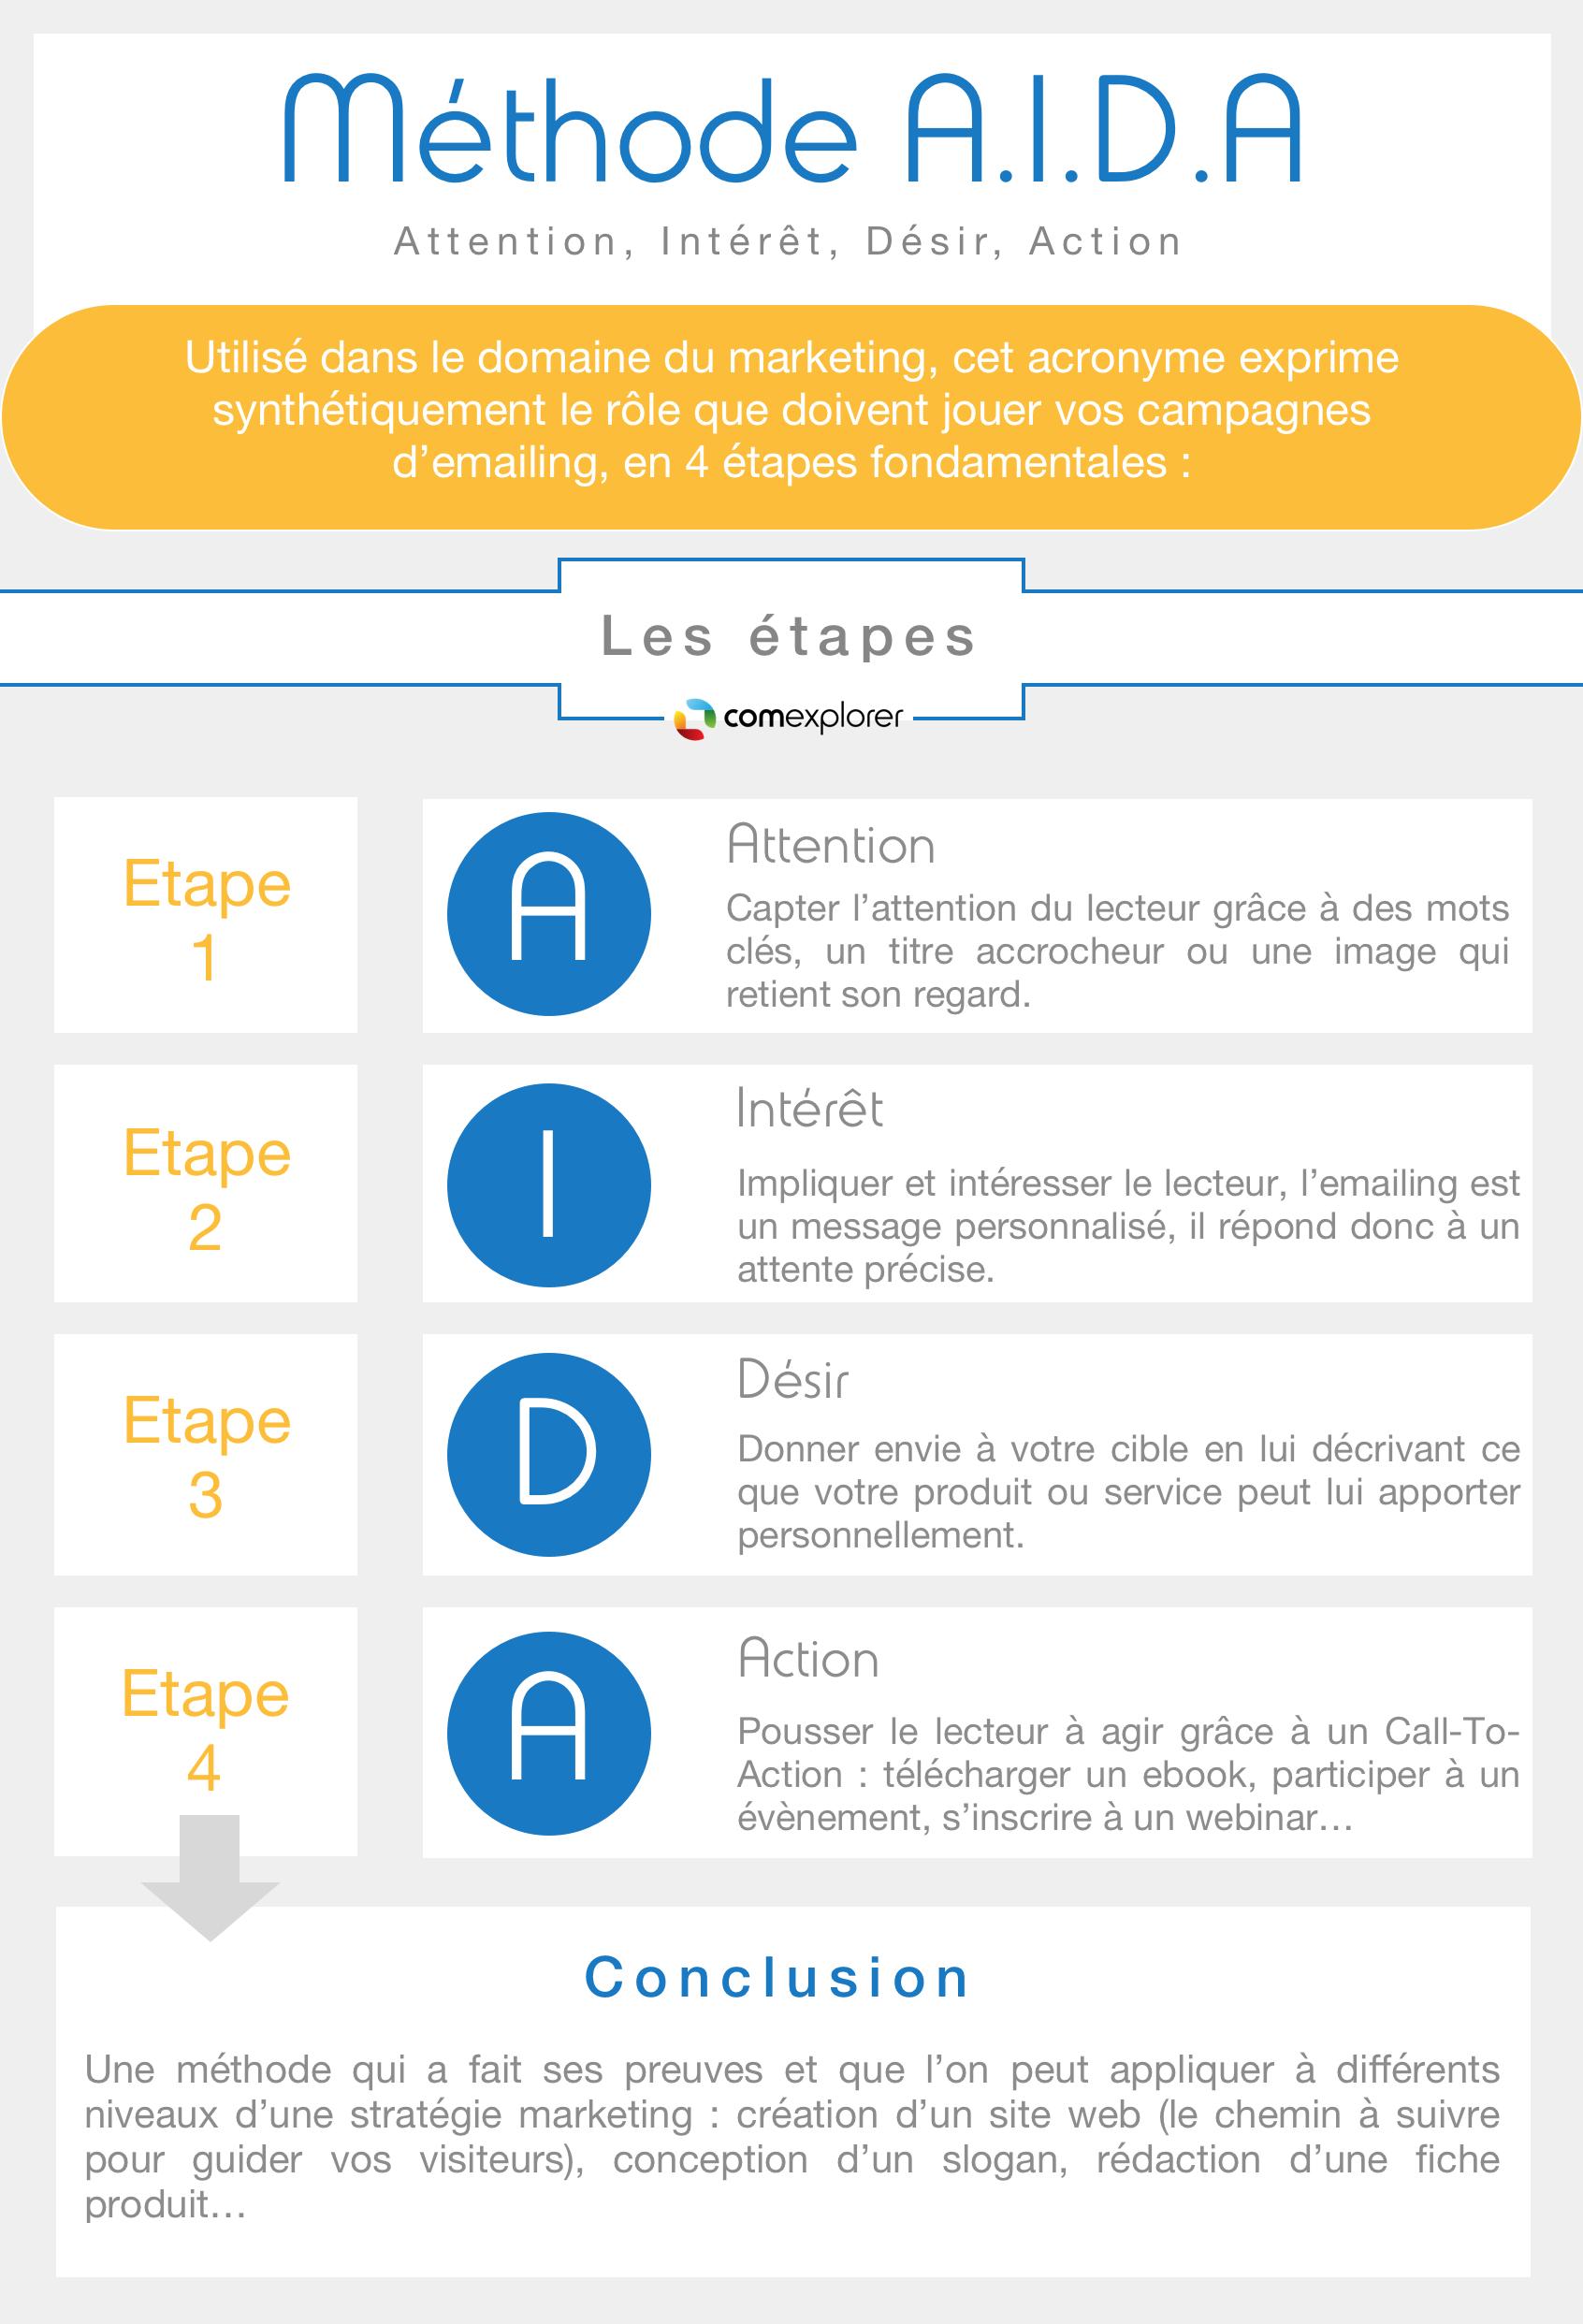 methode-aida-emailing-1